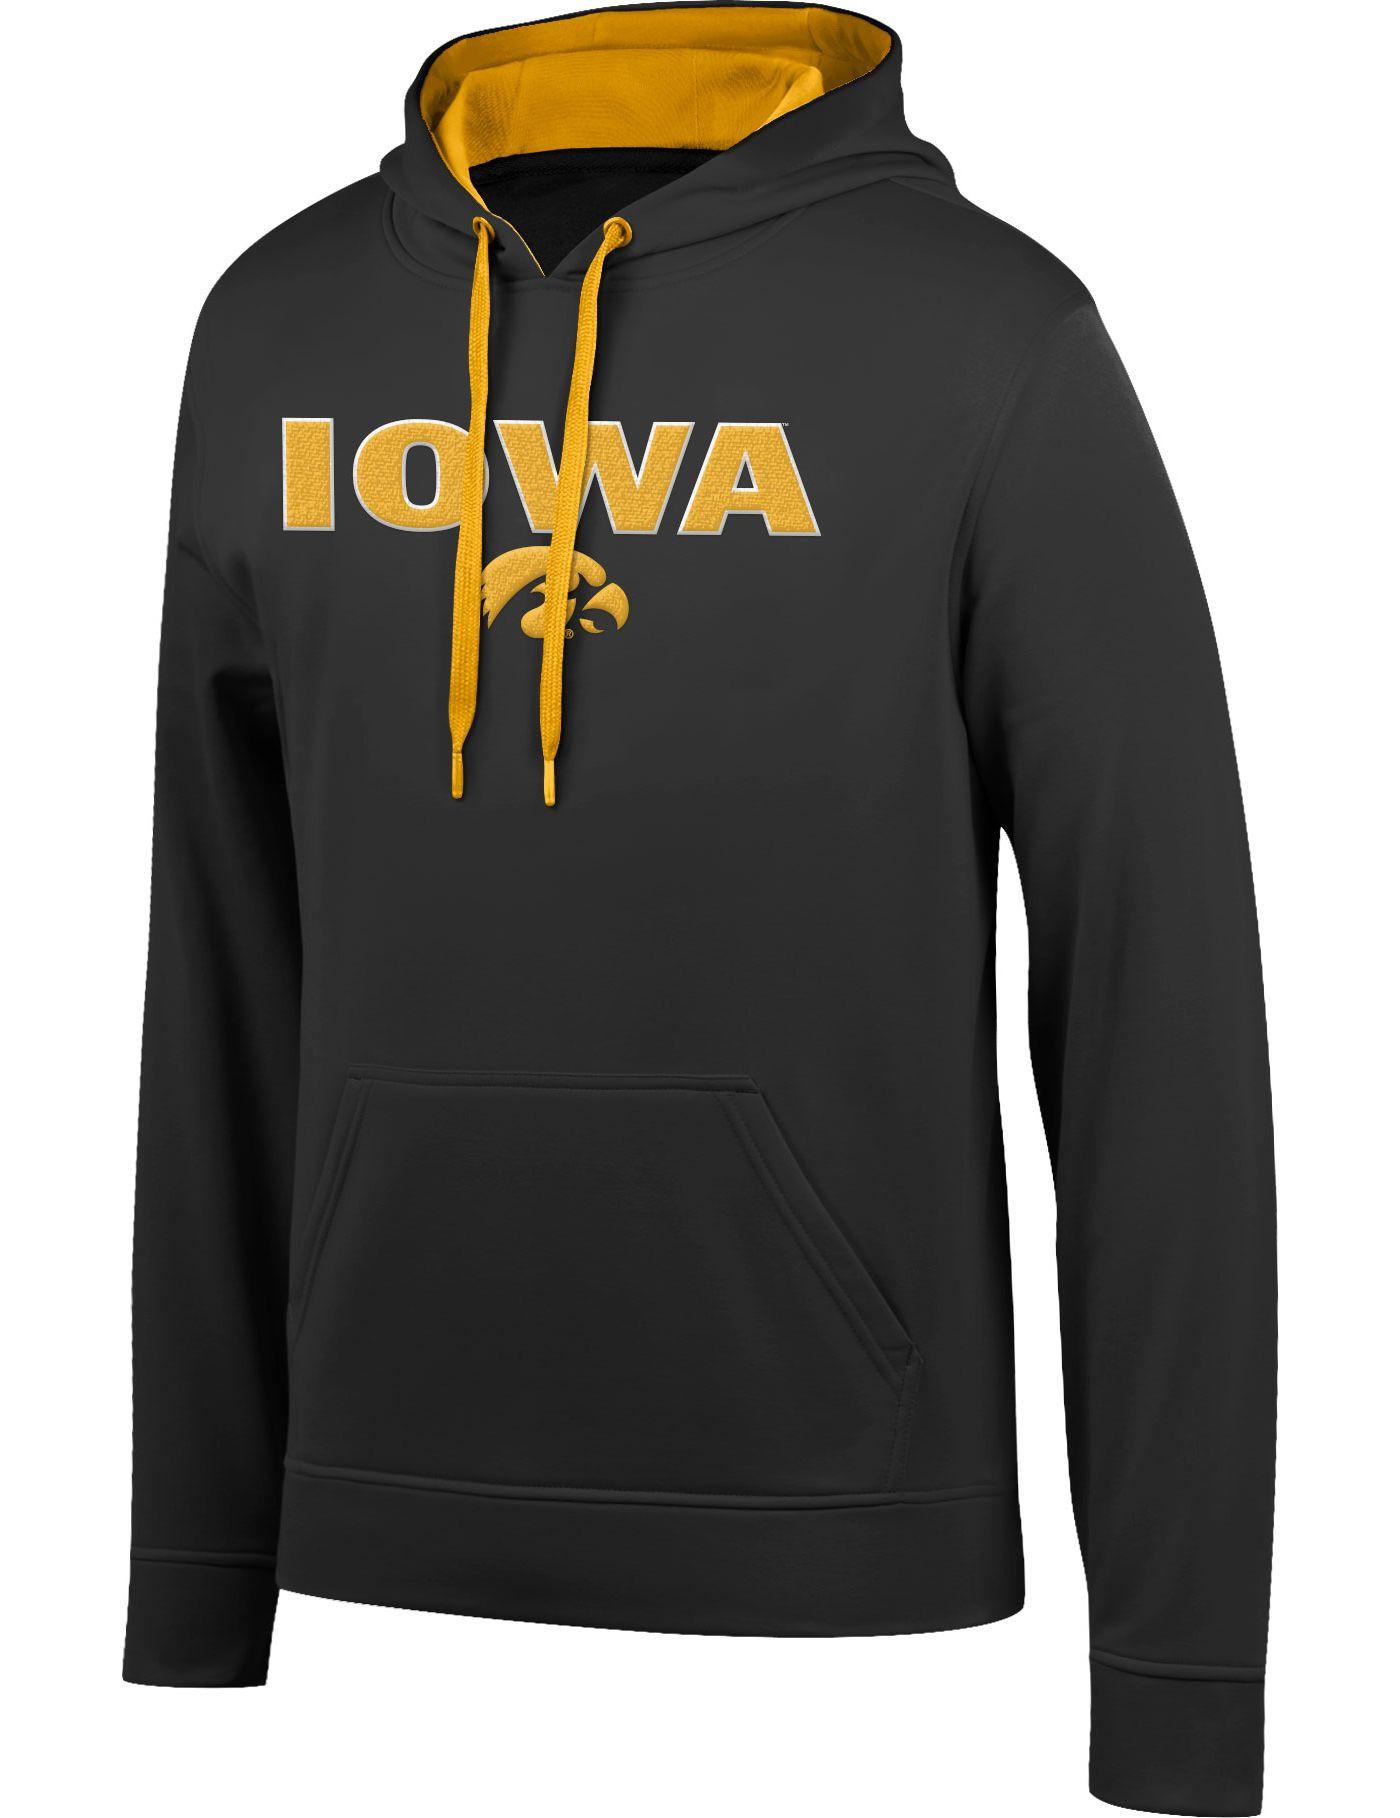 Top of the World Men's Iowa Hawkeyes Foundation Black Hoodie